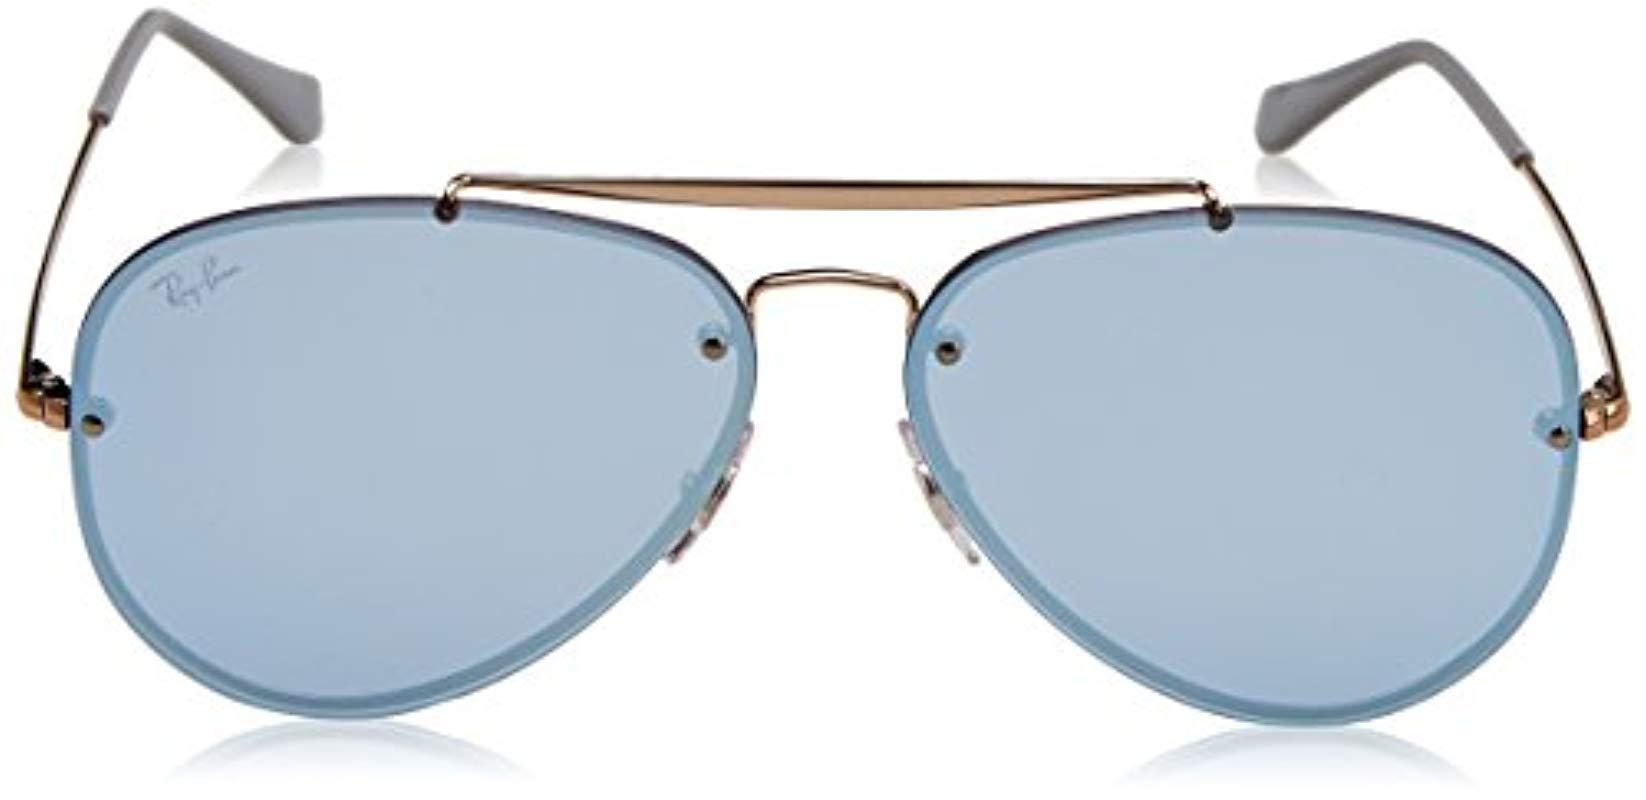 bf0717715b Ray-Ban - Multicolor Rb3584n Blaze Aviator Sunglasses - Lyst. View  fullscreen